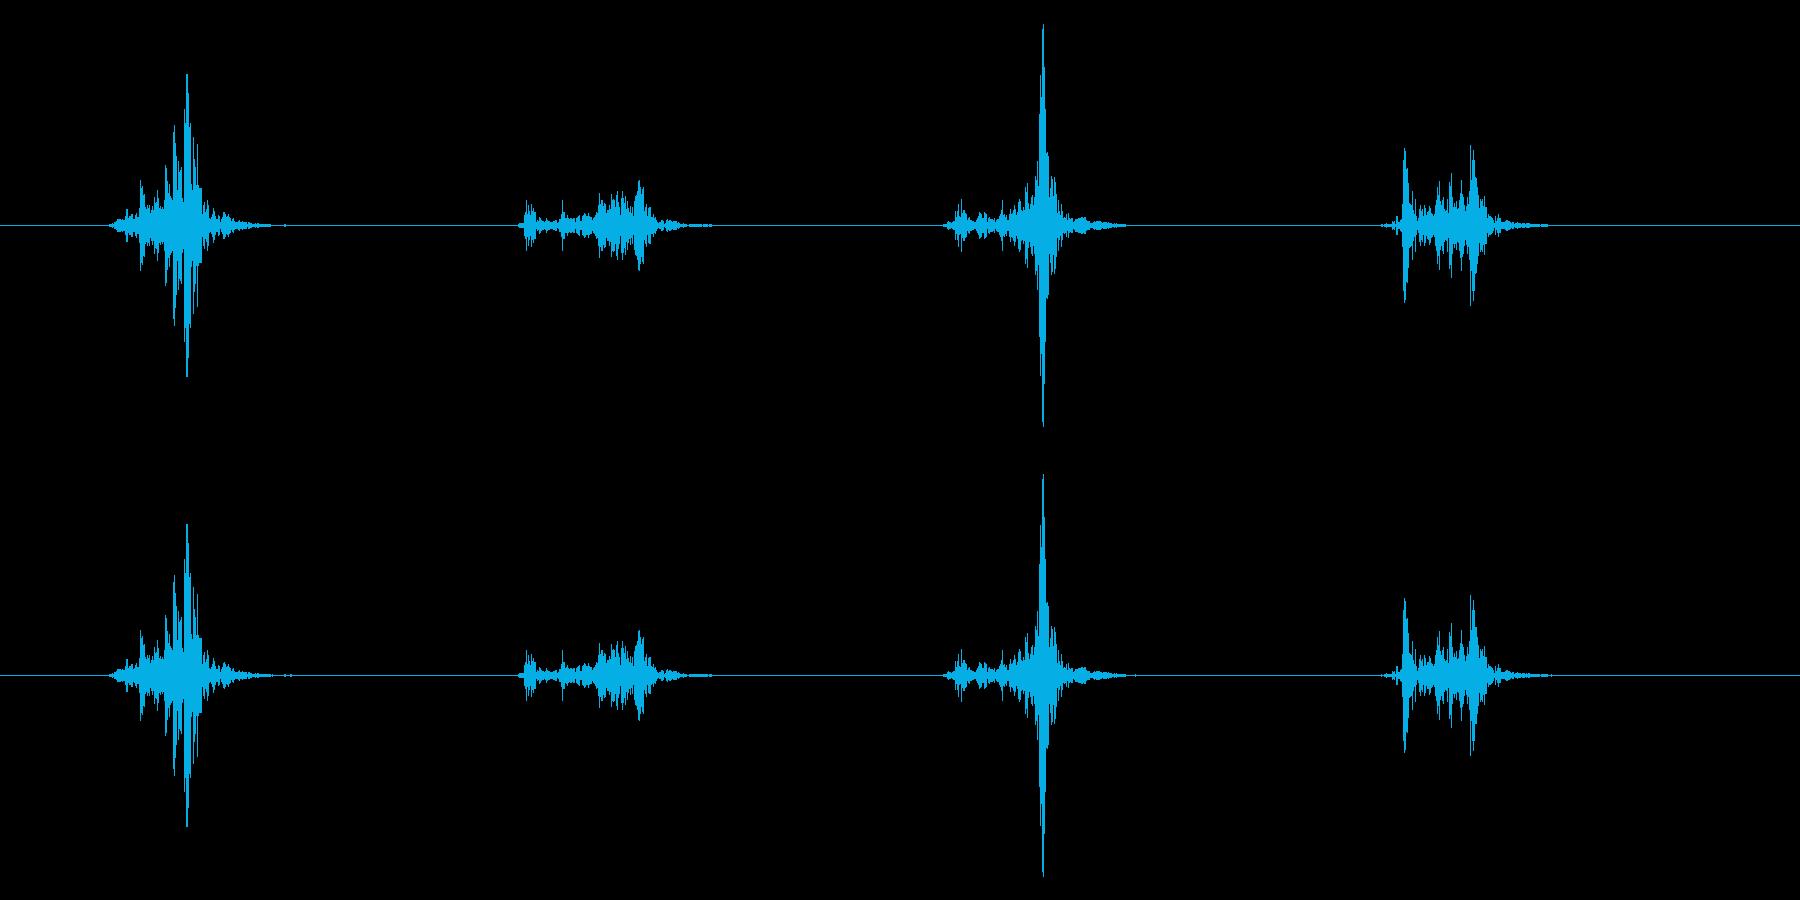 PC マウス04-22(スクロール 速)の再生済みの波形